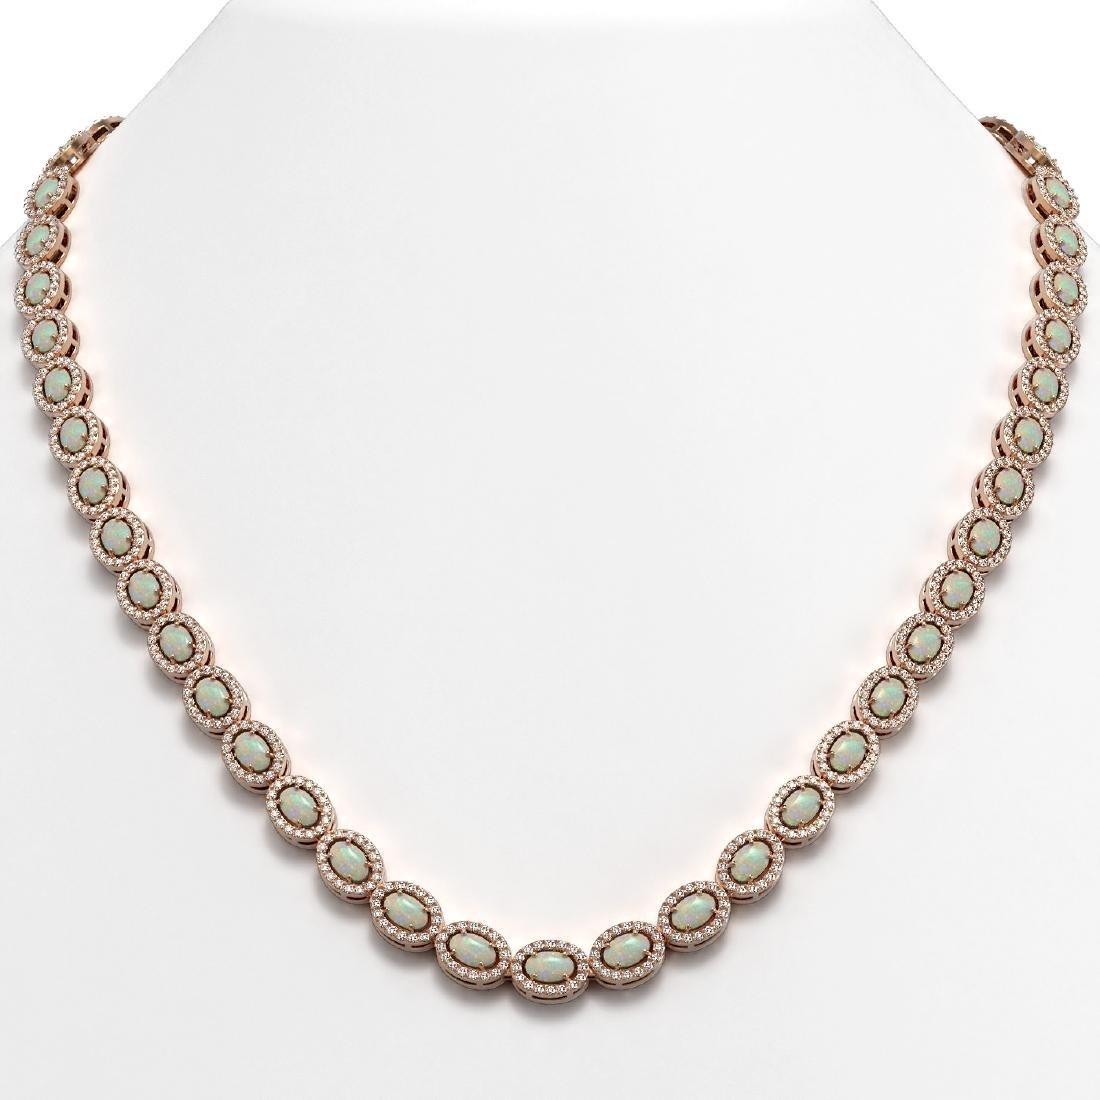 20.22 CTW Opal & Diamond Halo Necklace 10K Rose Gold